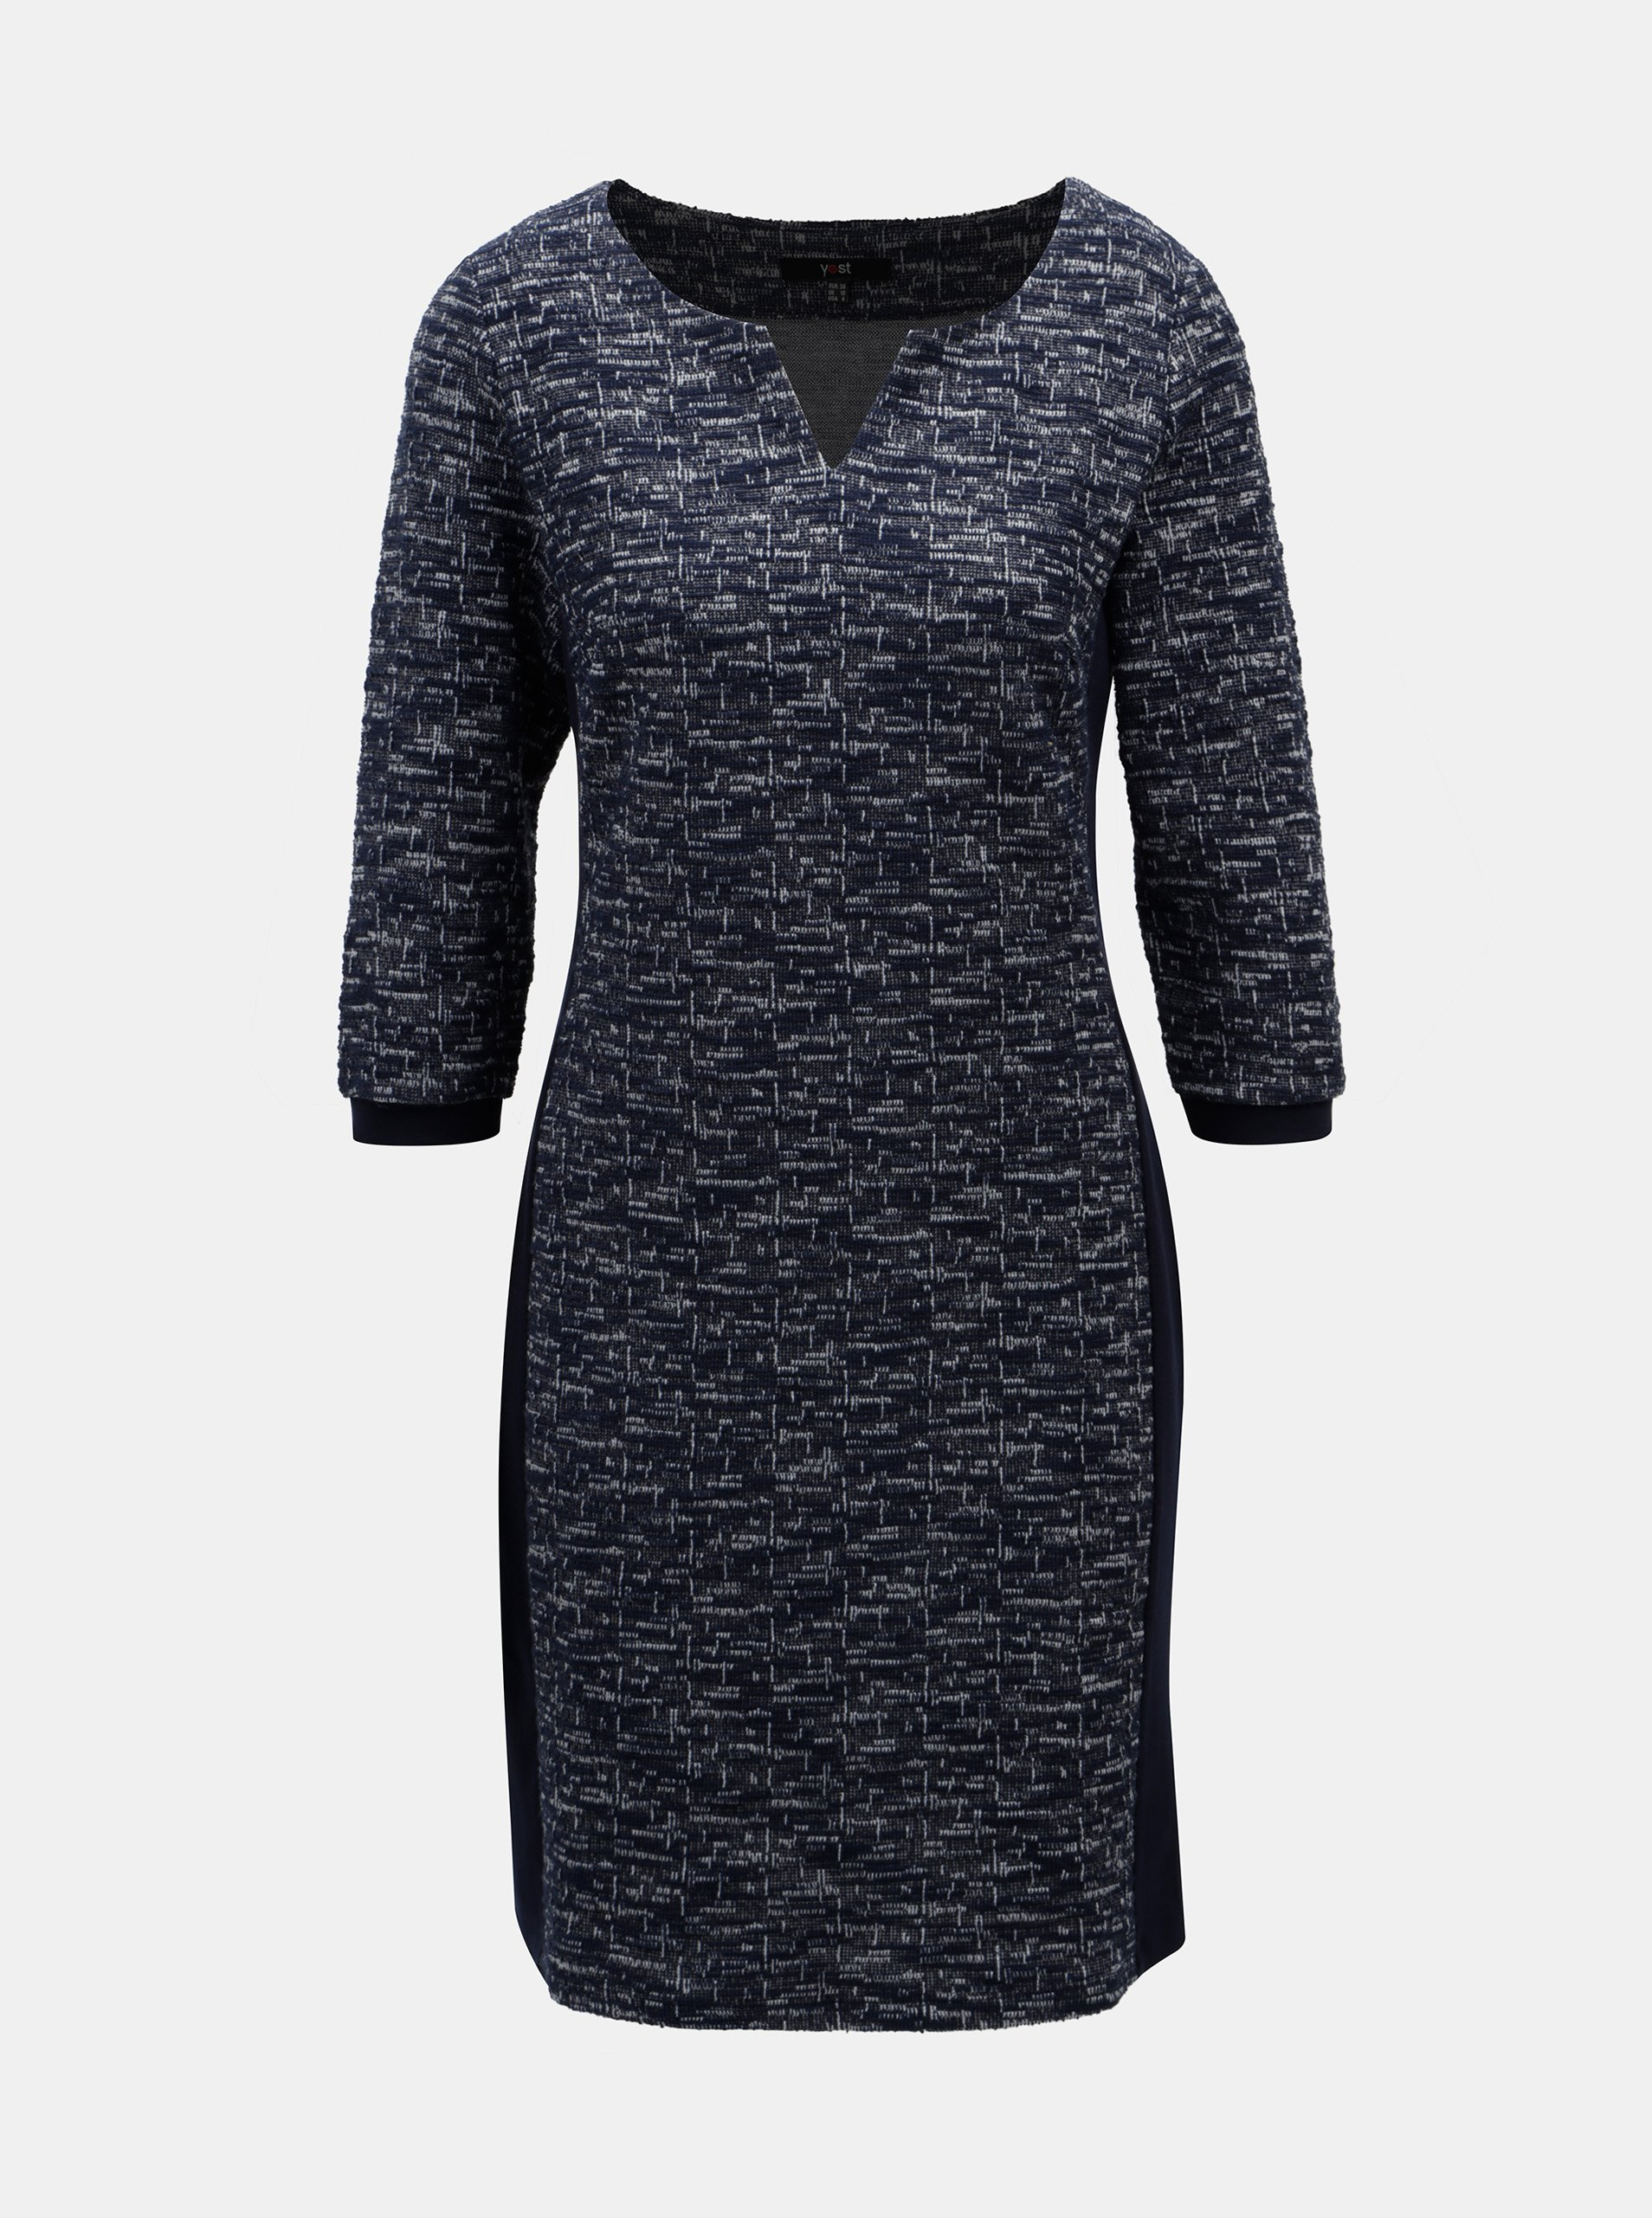 Tmavomodré melírované šaty s 3/4 rukávom Yest